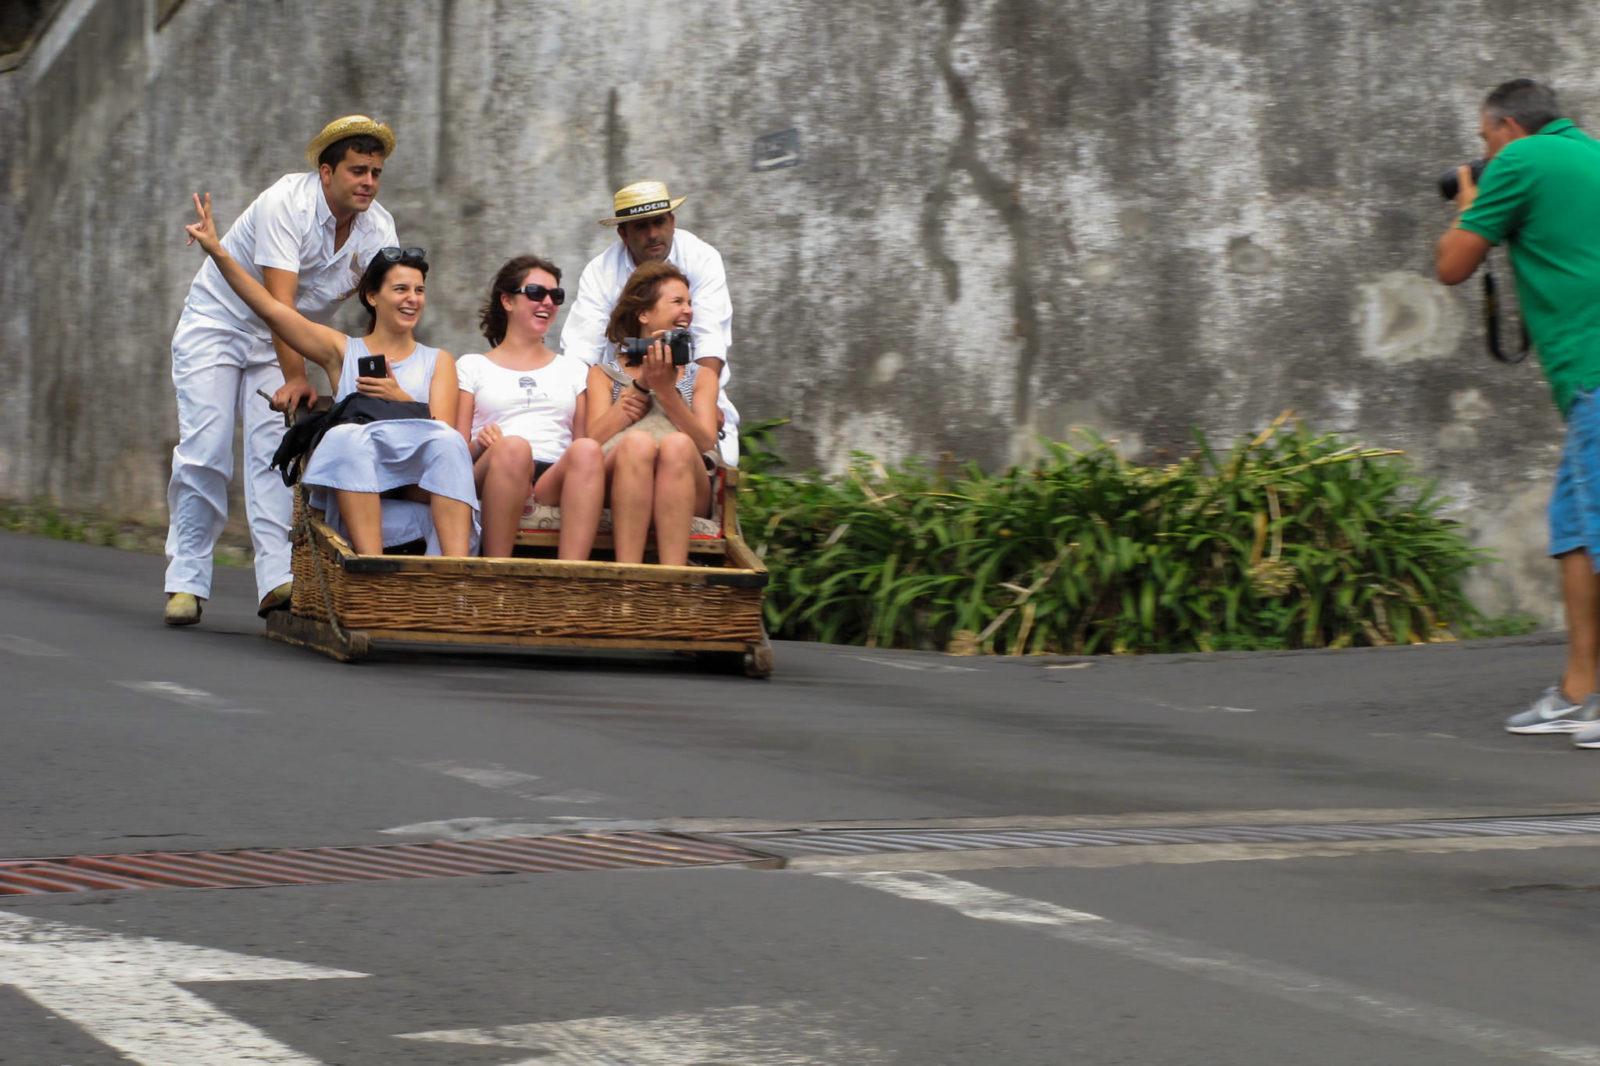 Делают снимок по дороге (фото: emmapatsie)